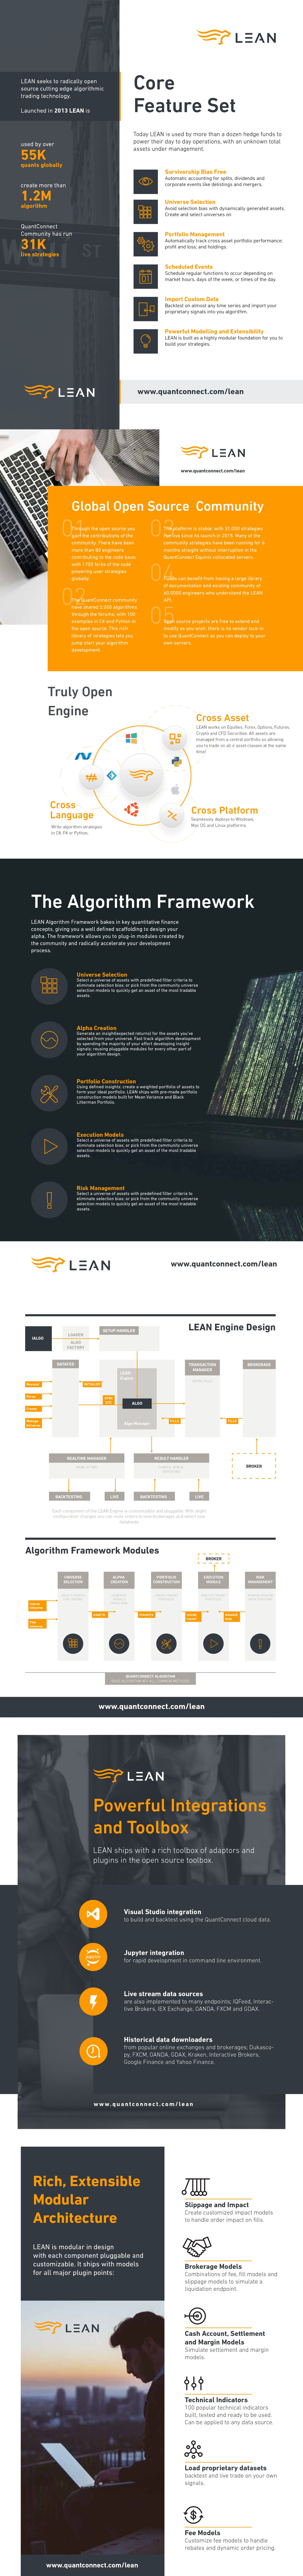 Promo Flyer for Cutting Edge Algorithm Design Technology (LEAN)